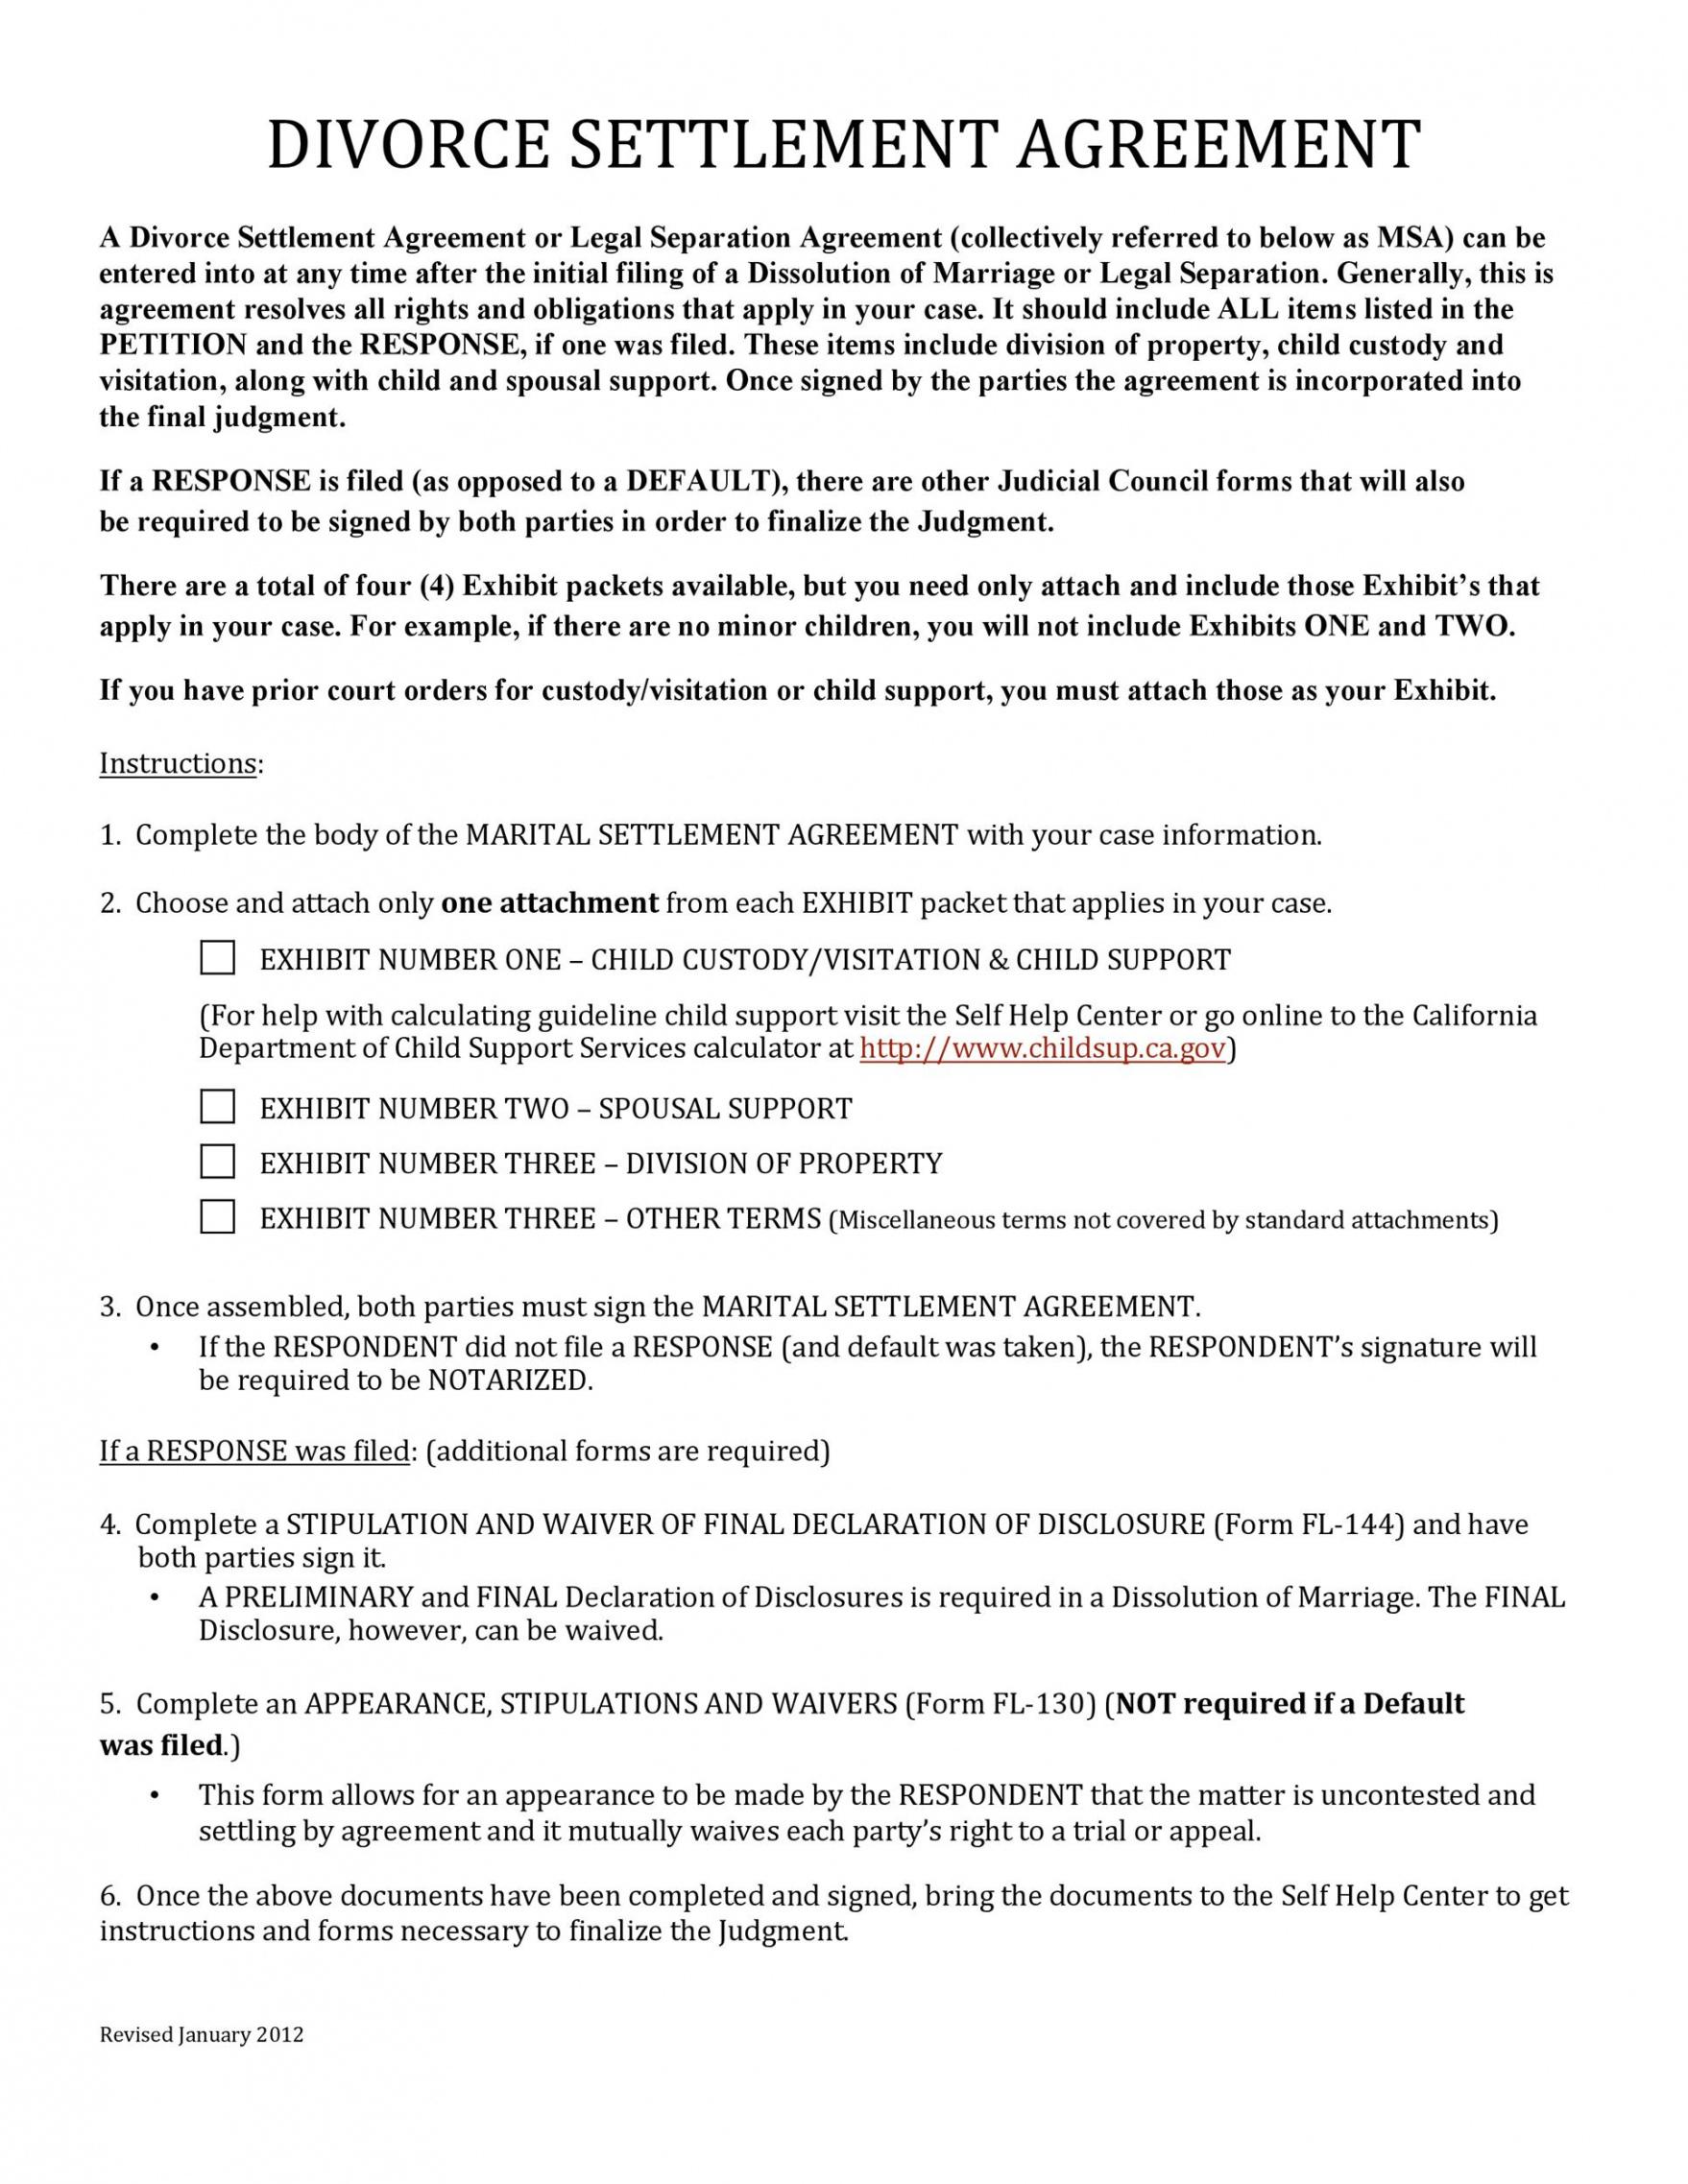 printable 42 divorce settlement agreement templates 100% free ᐅ divorce settlement agreement template word